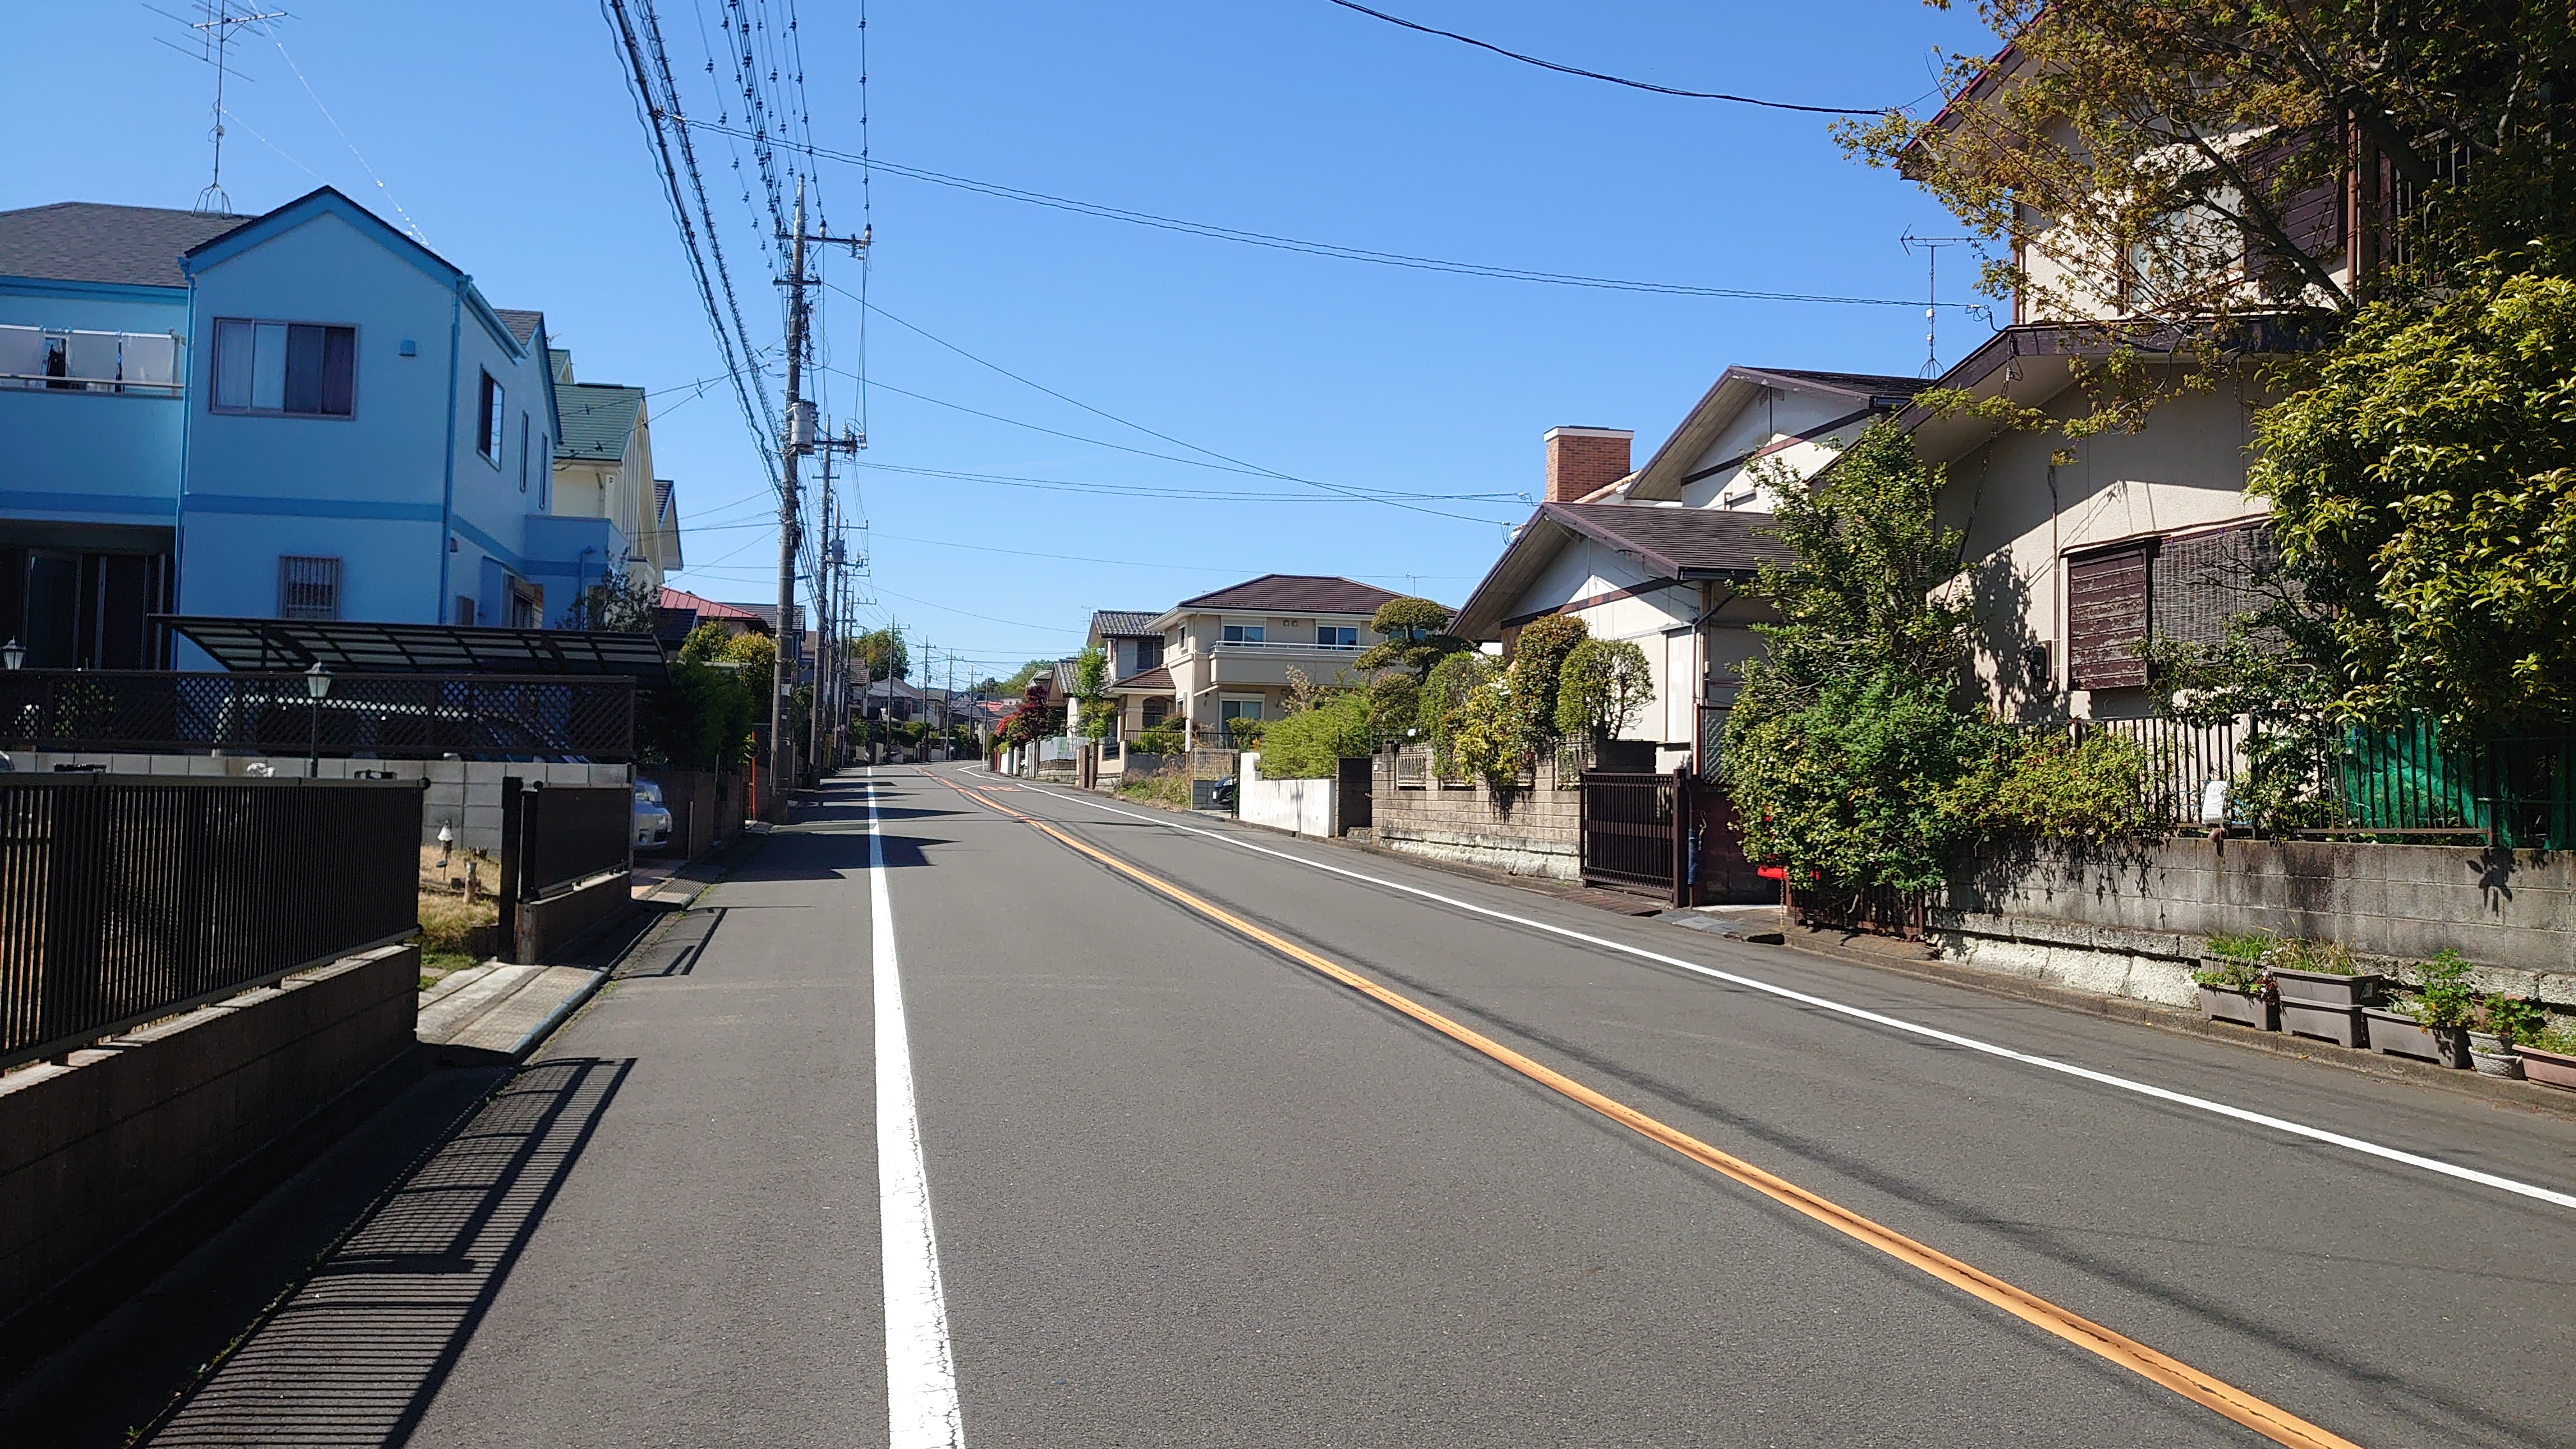 Один день домохозяйки в недоизоляции, Япония, фото 17